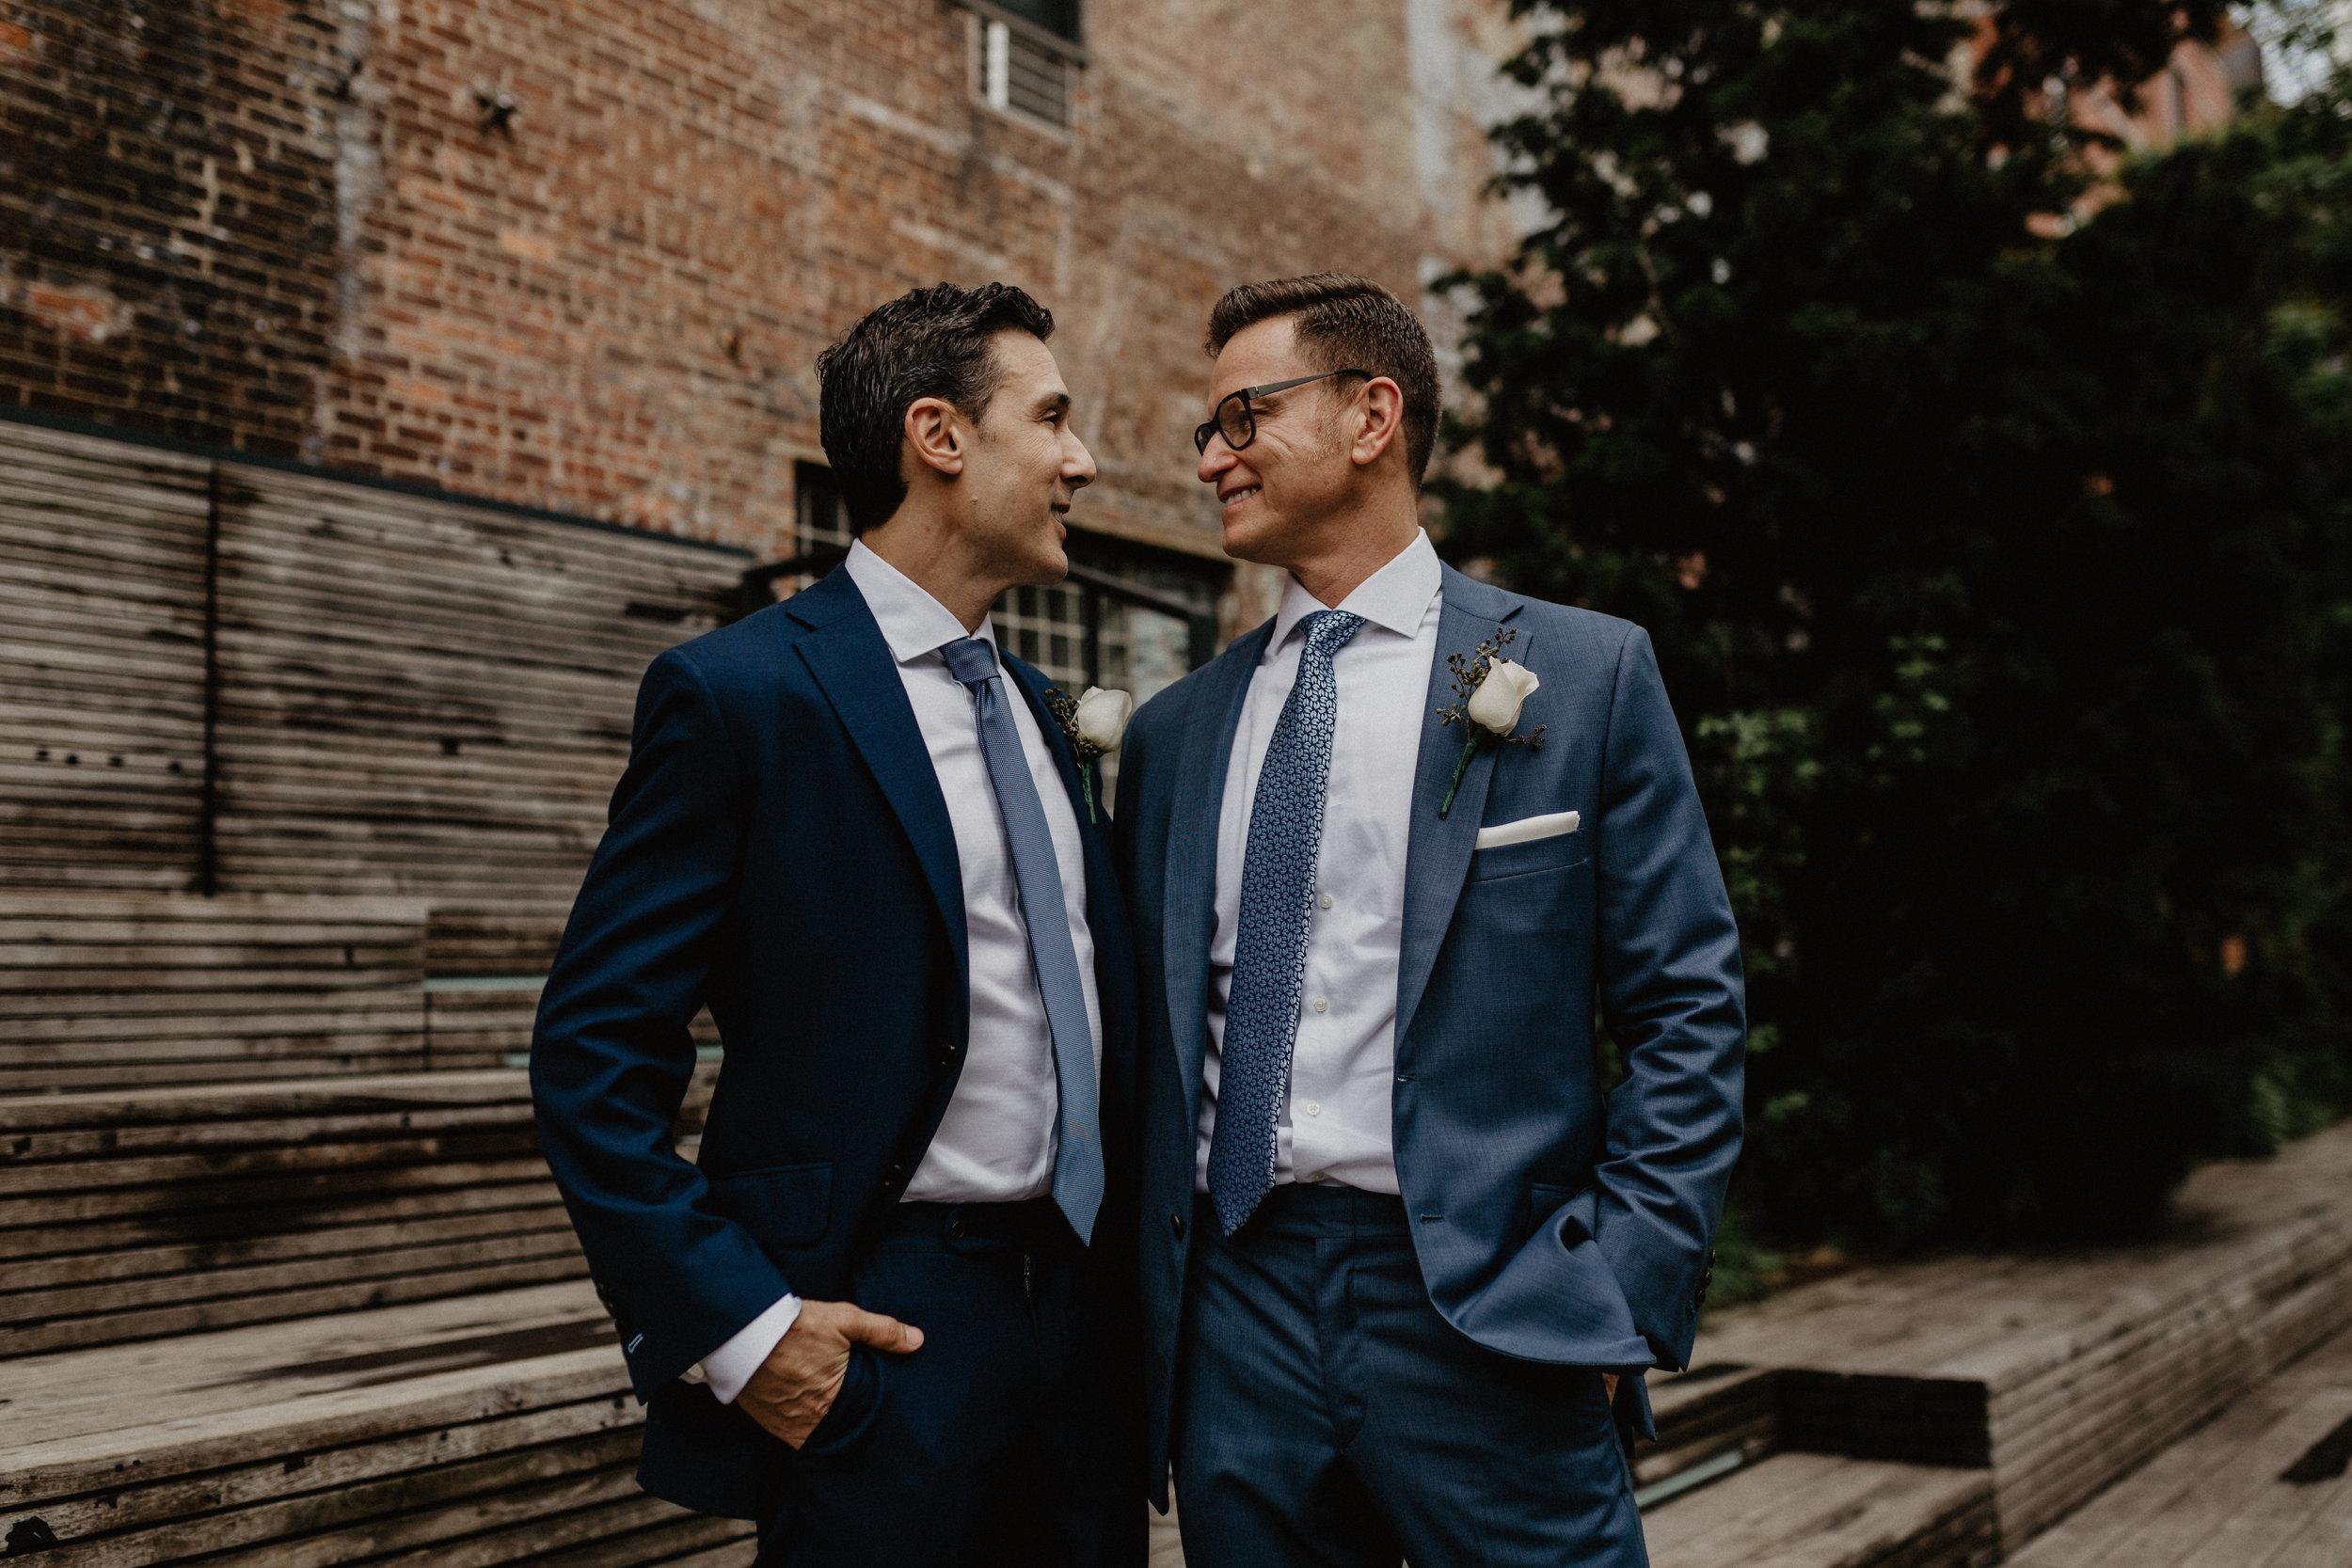 same_sex_nyc_wedding_015.jpg